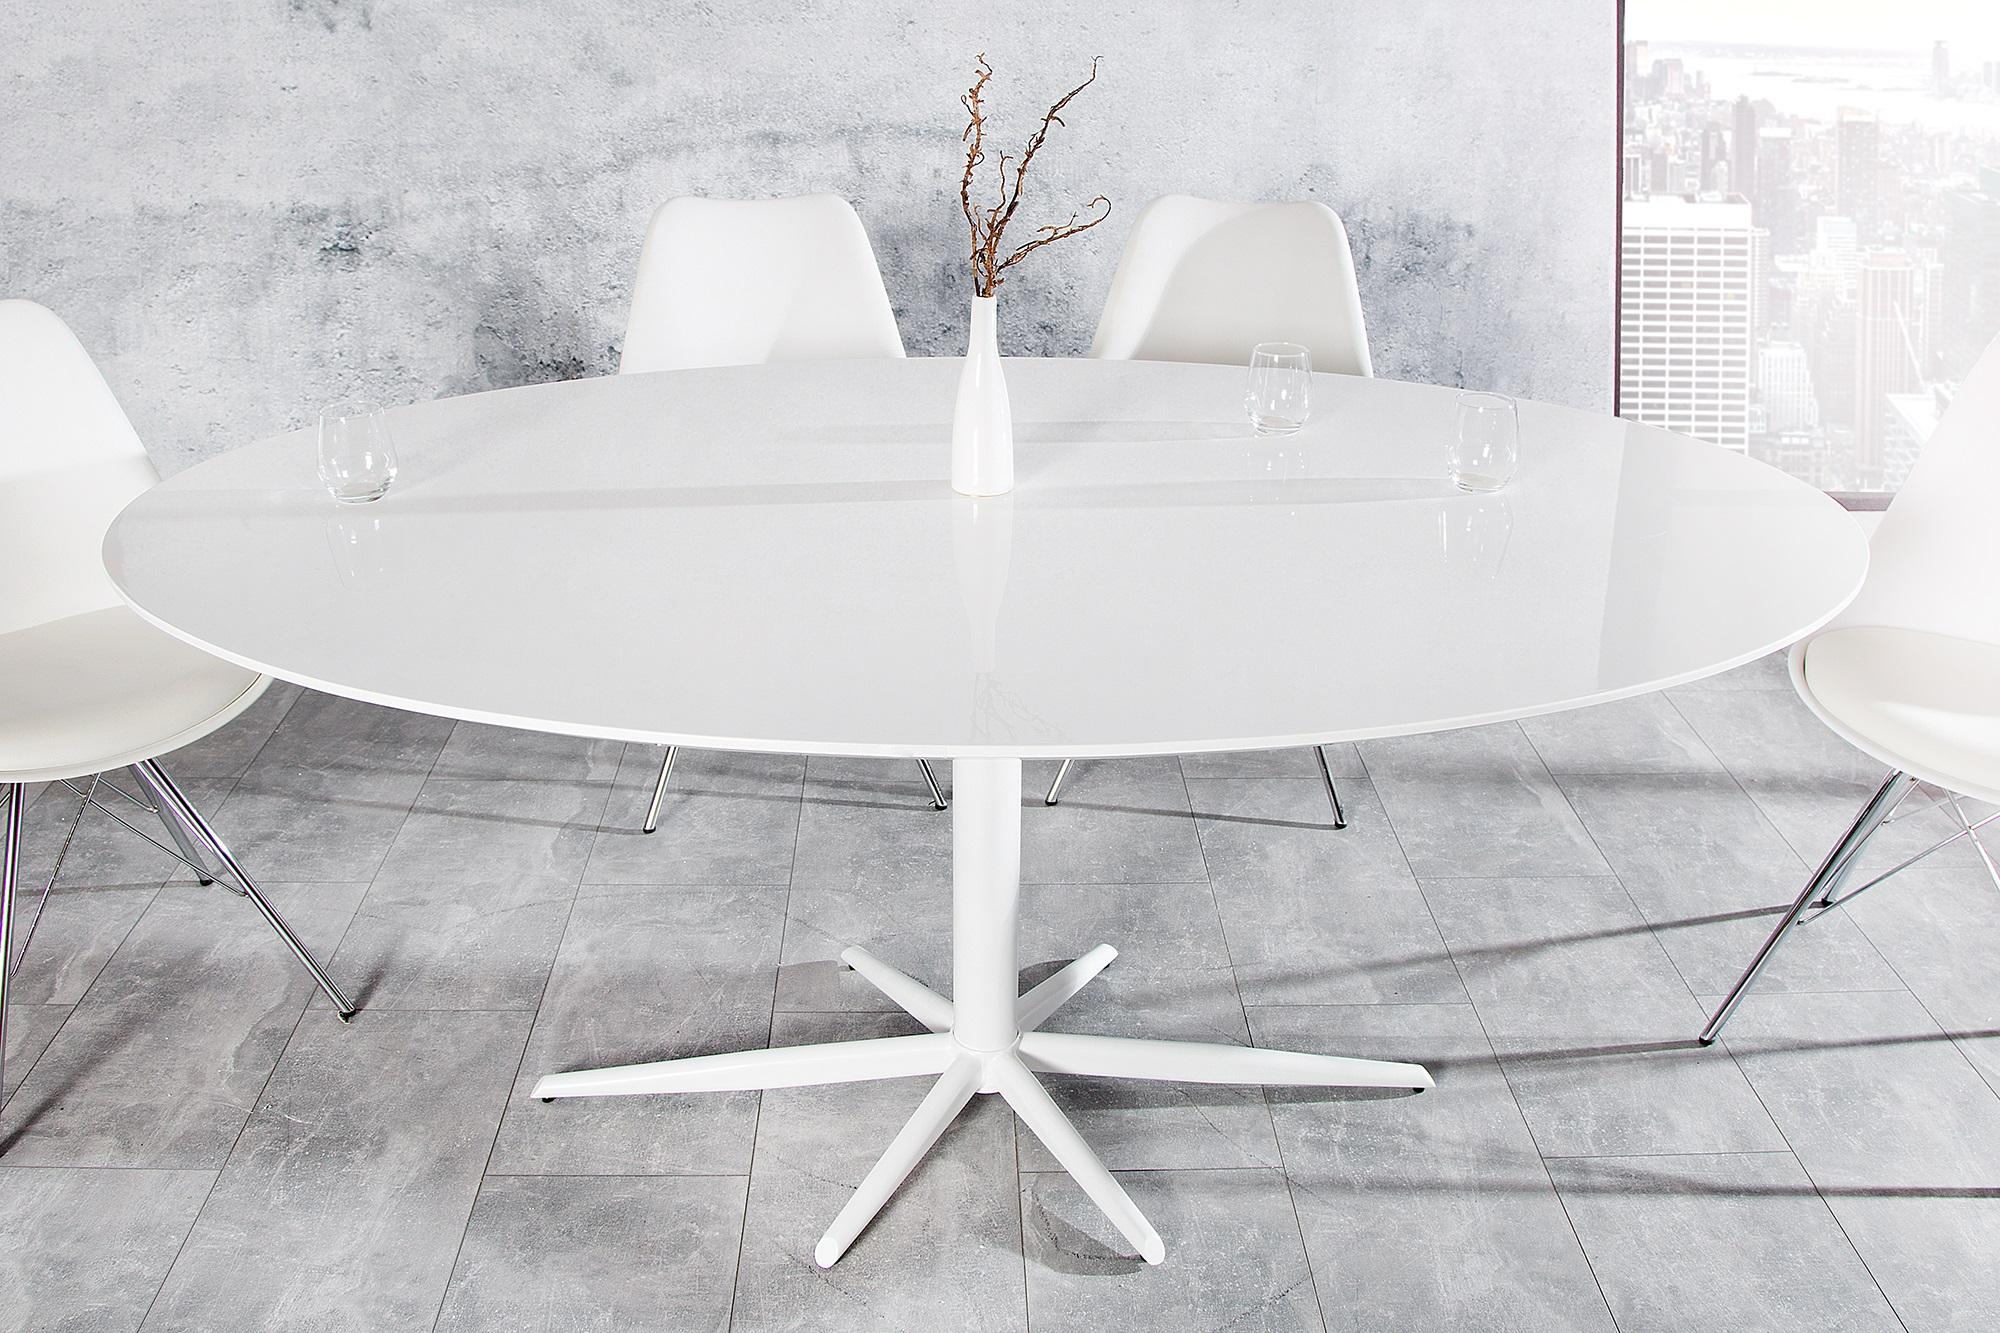 Hoogglans Witte Tafel : Witte tafel hoogglans aktie wonen.nl